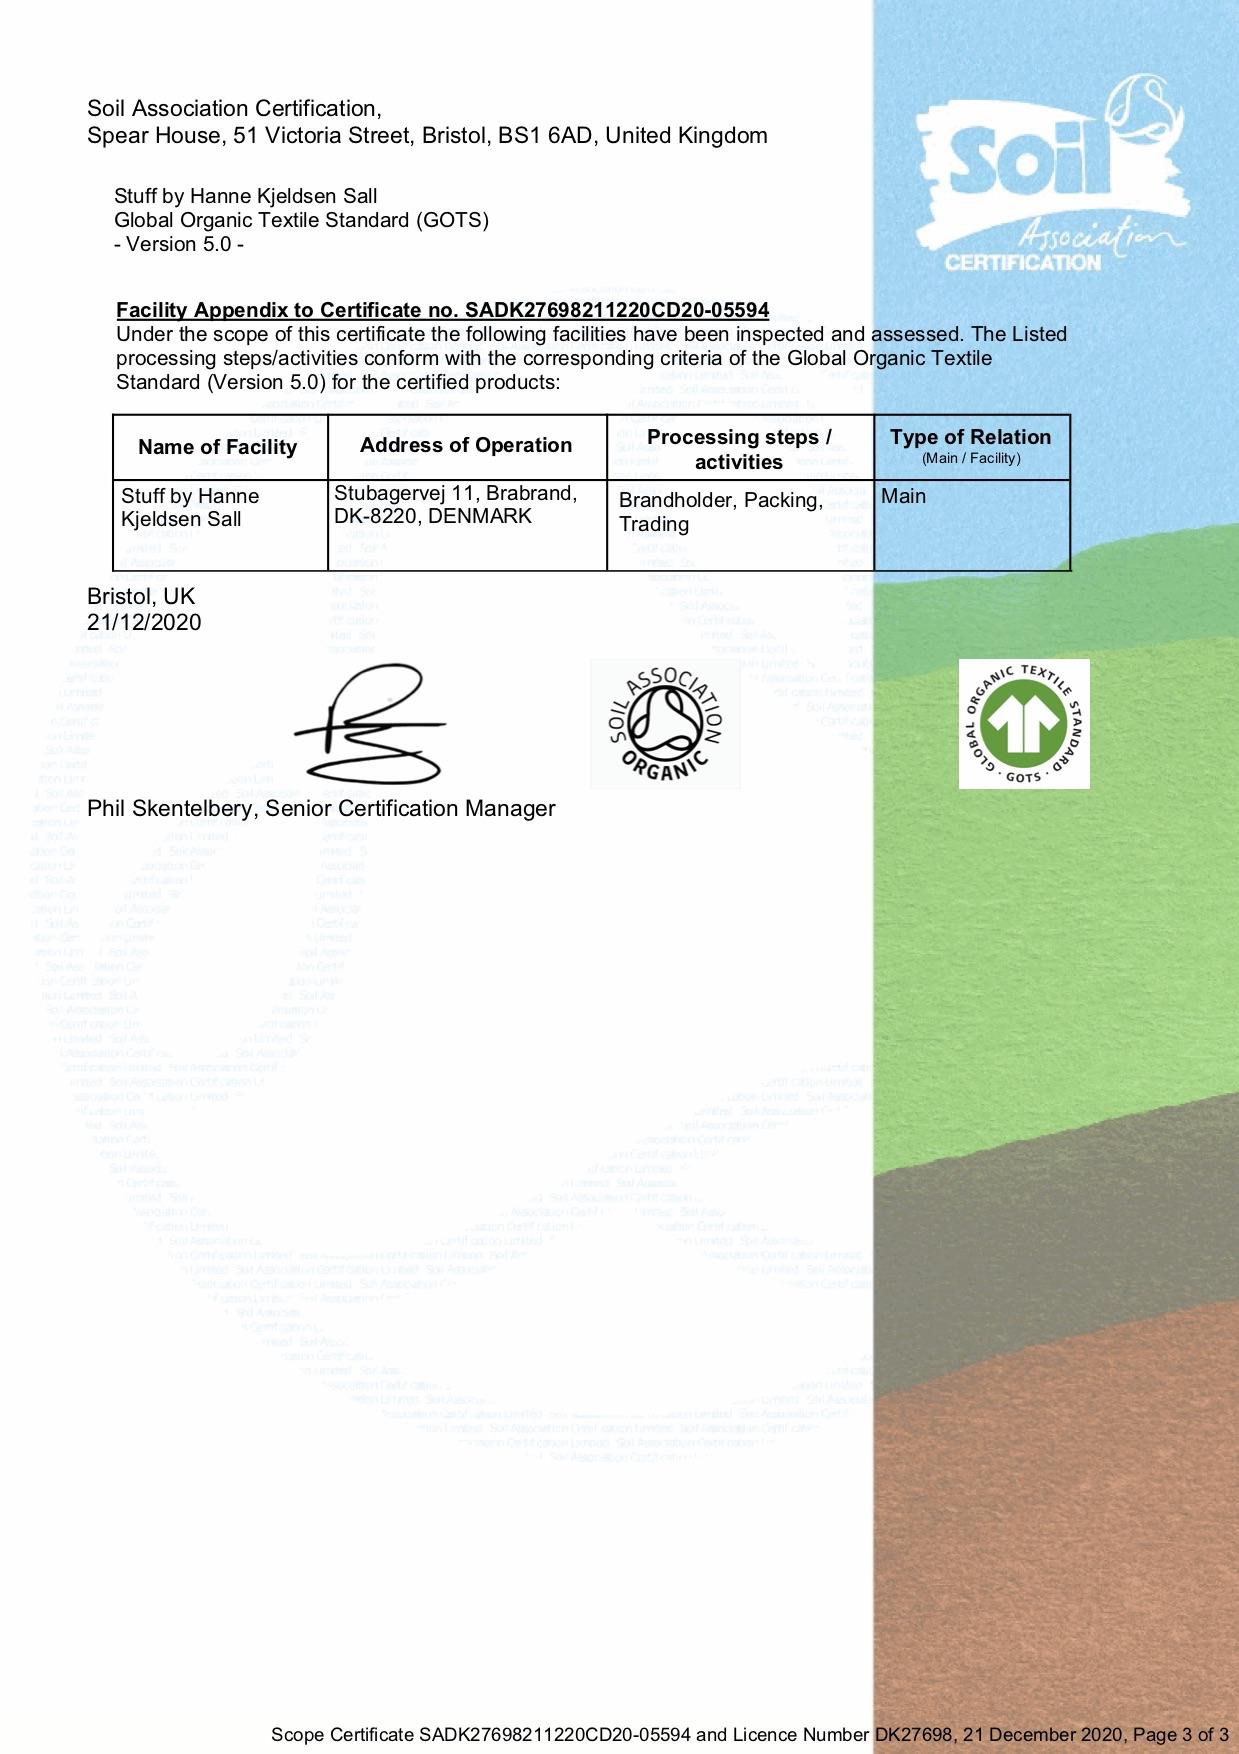 GOTS Licens DK27698 TrueStuff Soil Association